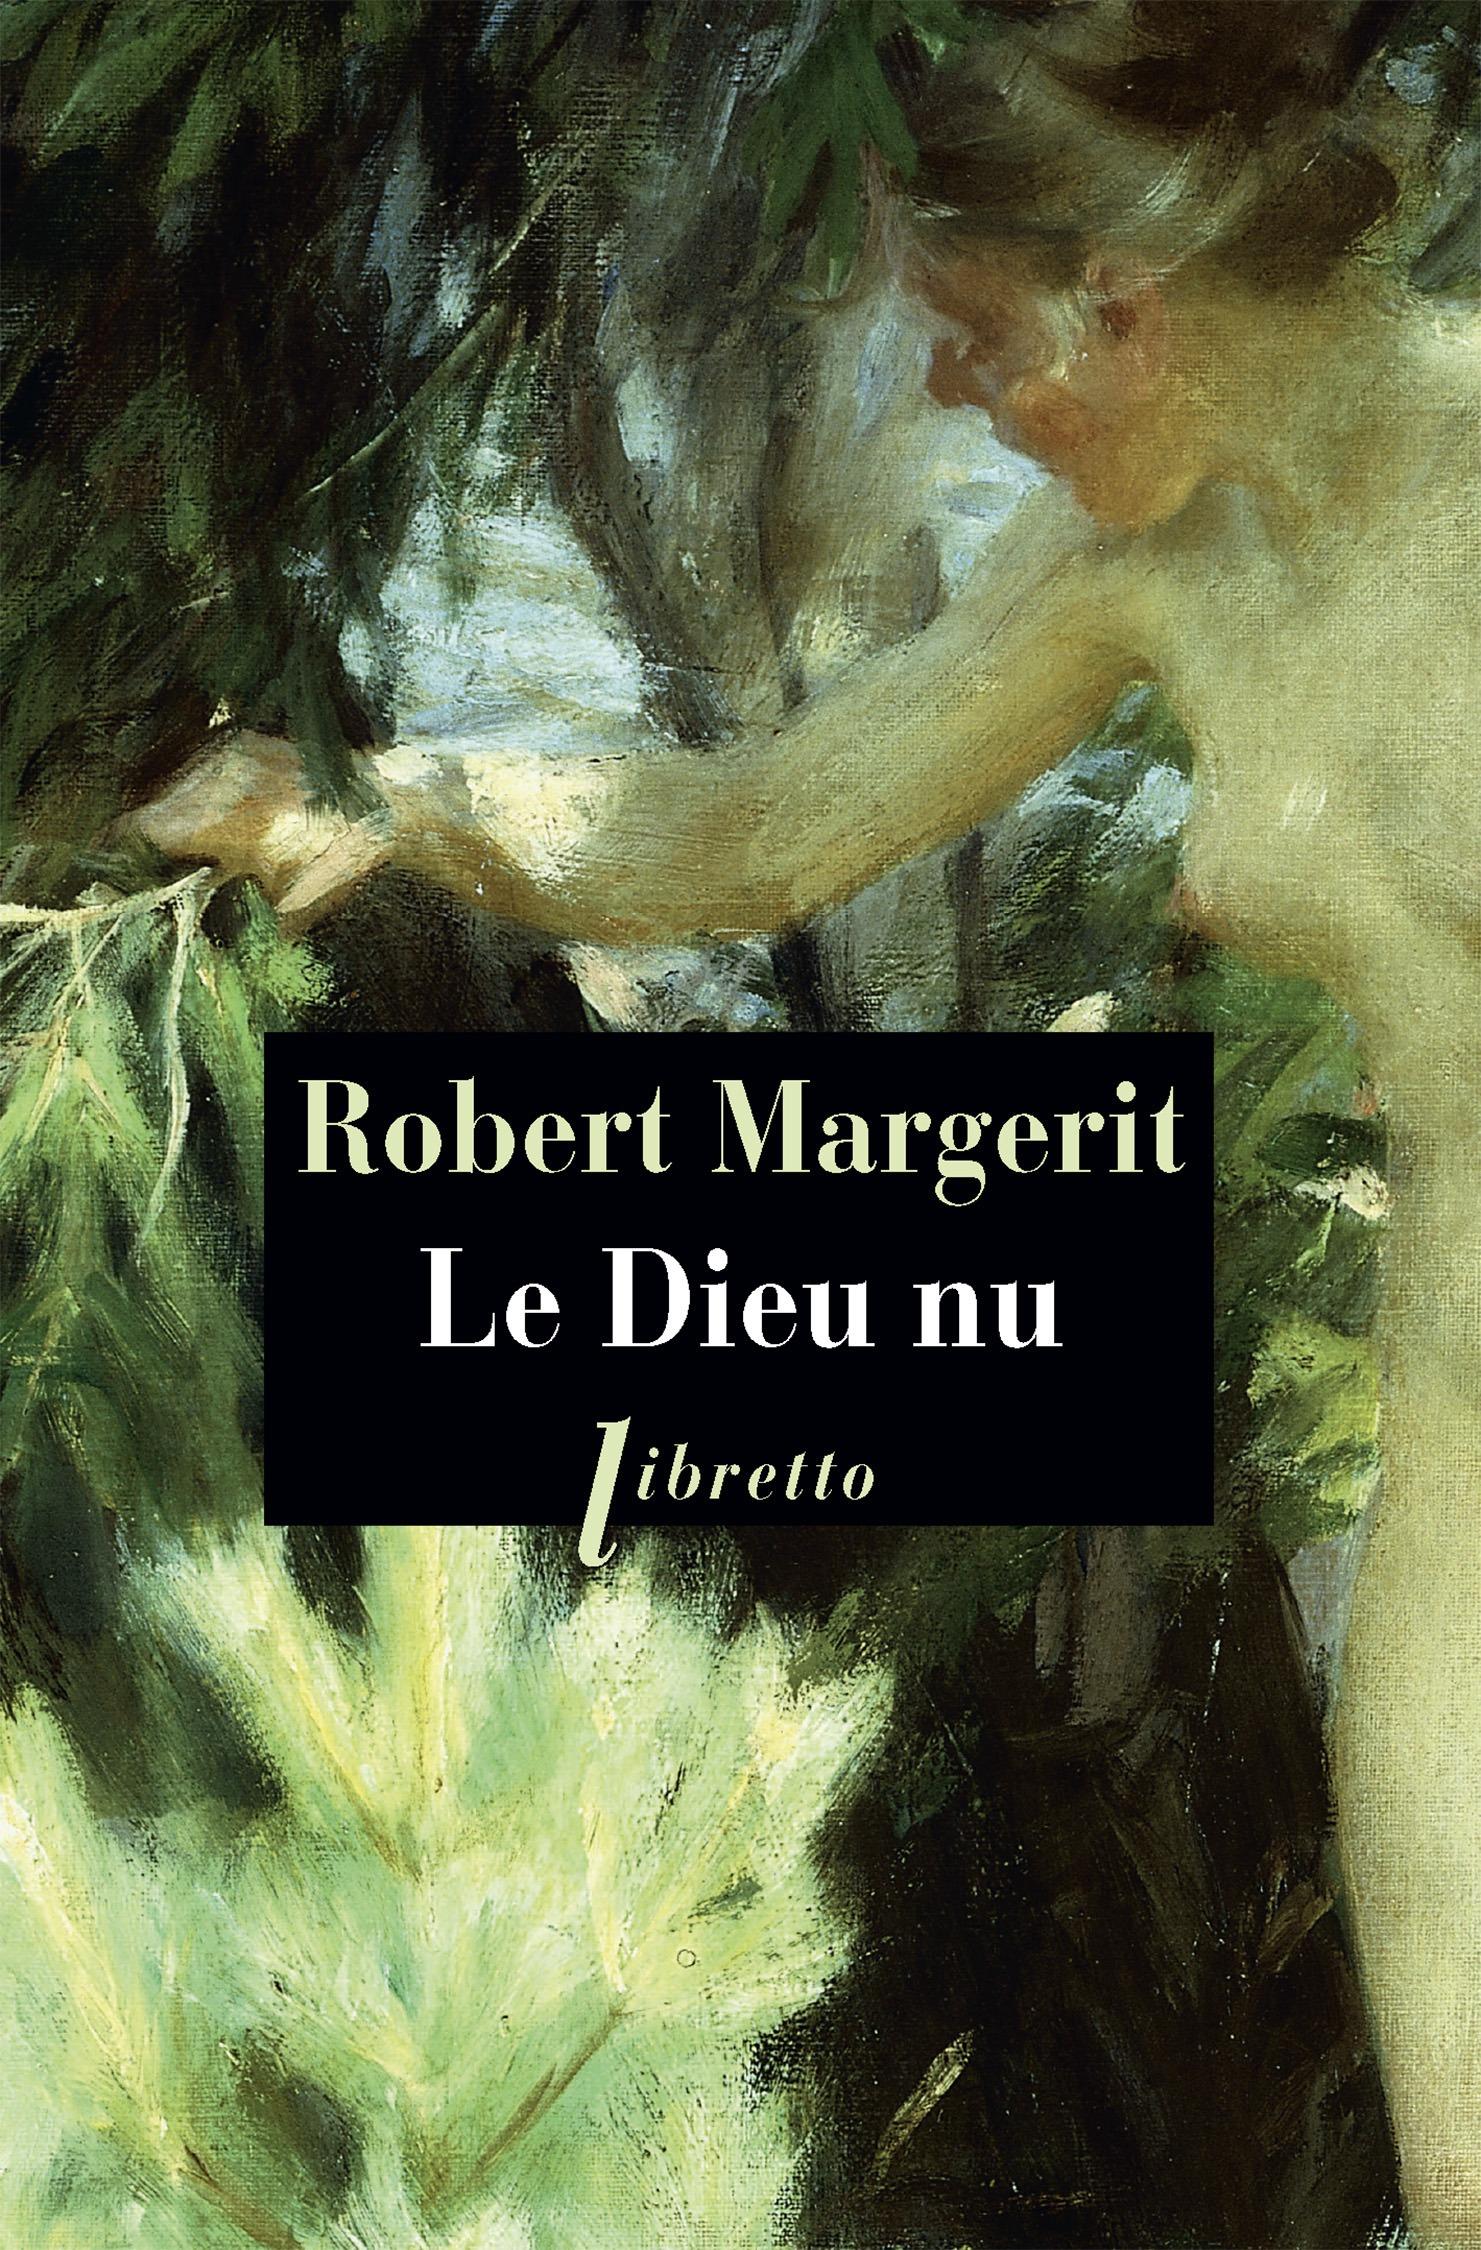 Robert Margerit Le Dieu nu